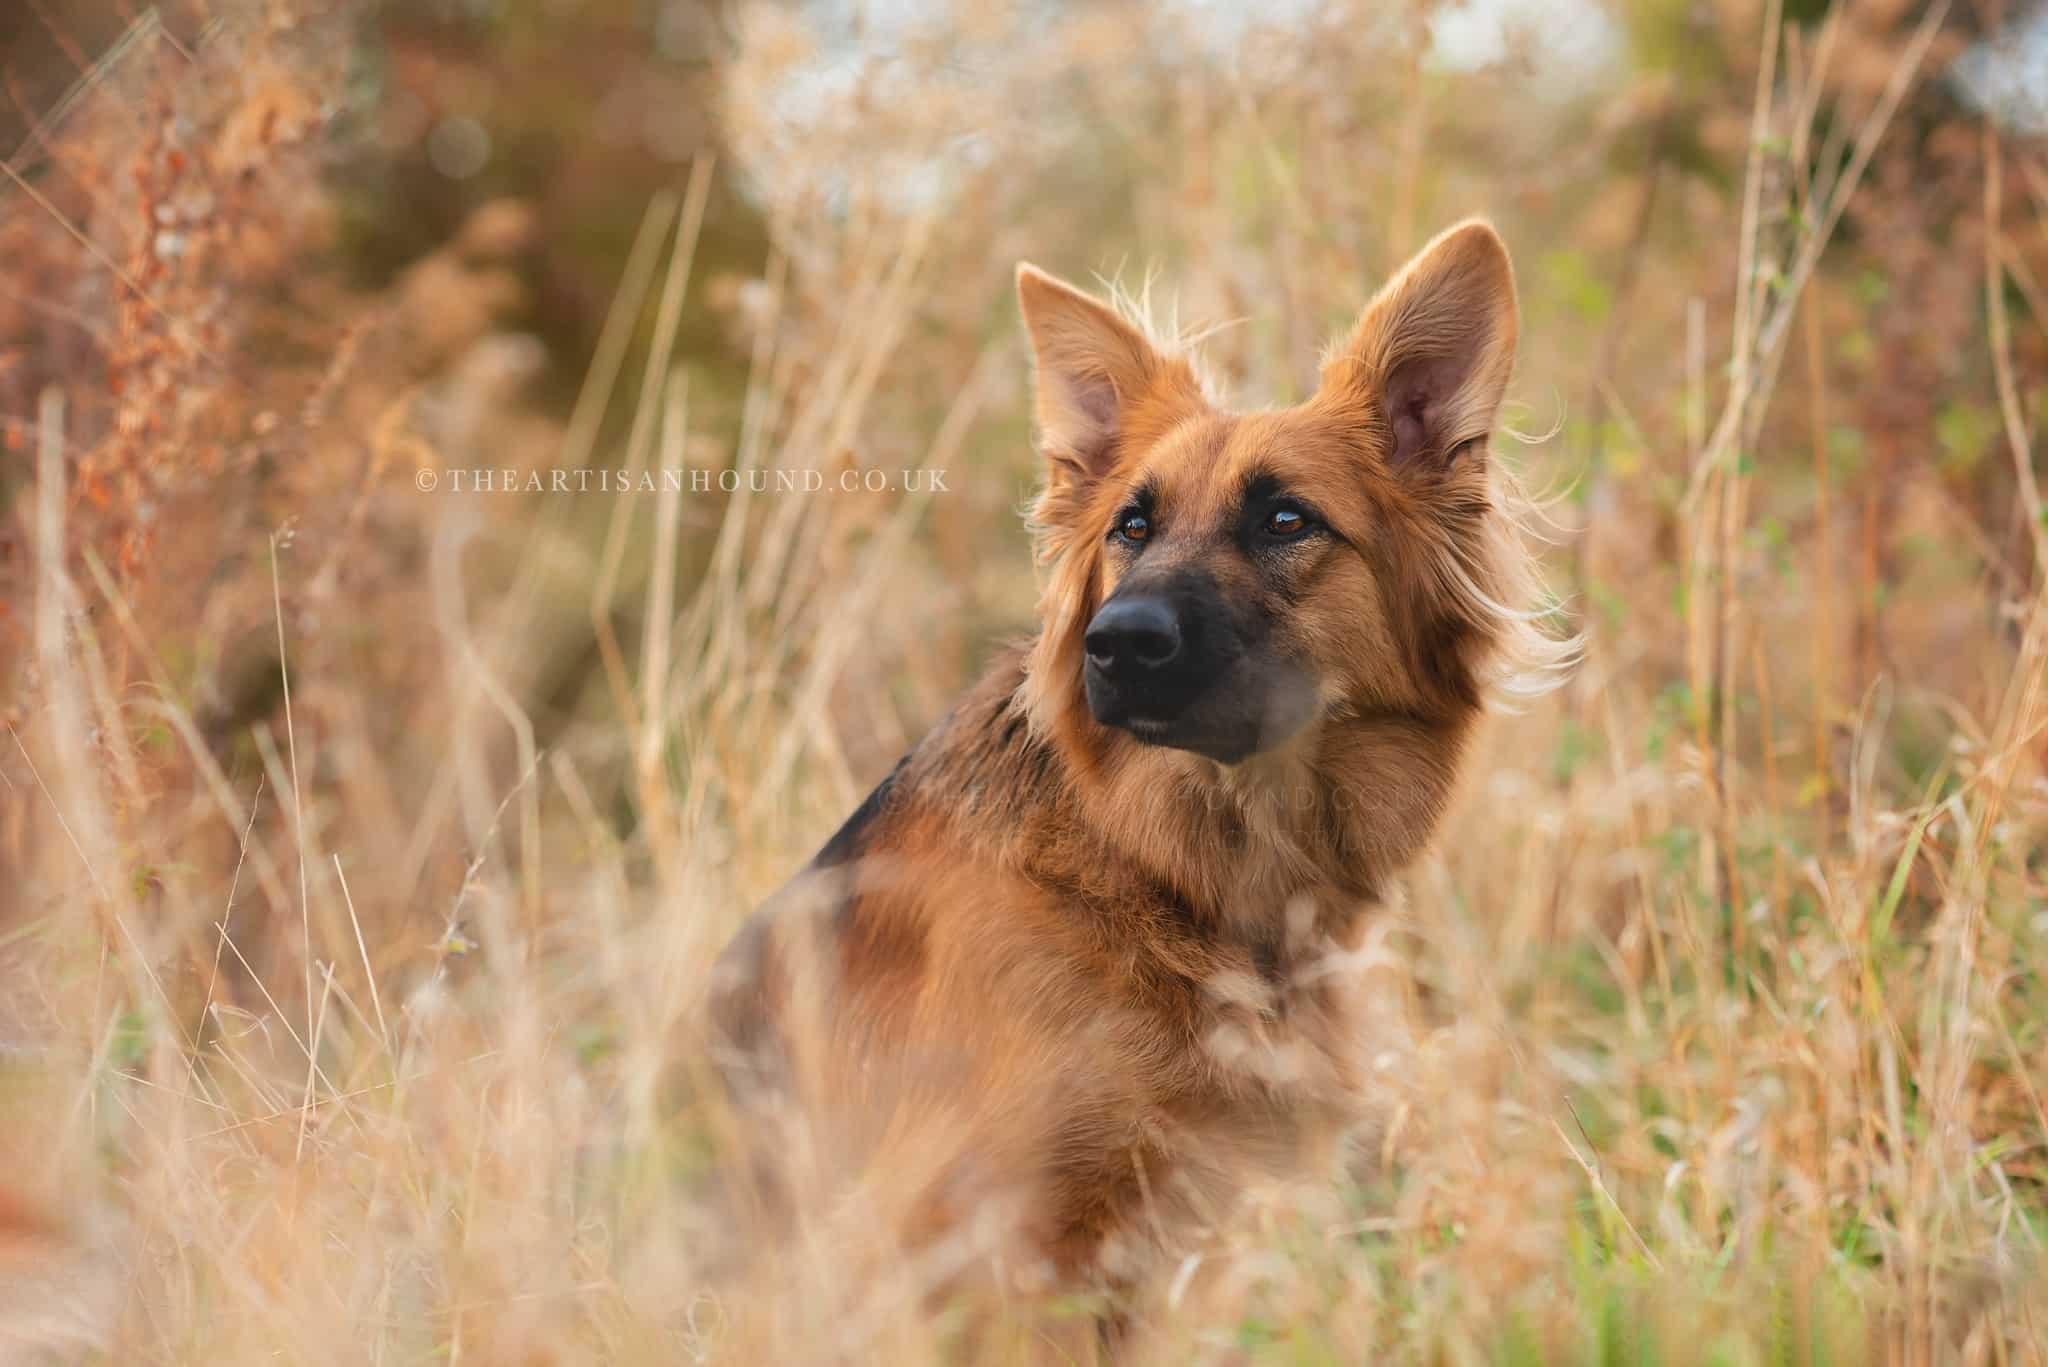 kettering dog photographer 0715